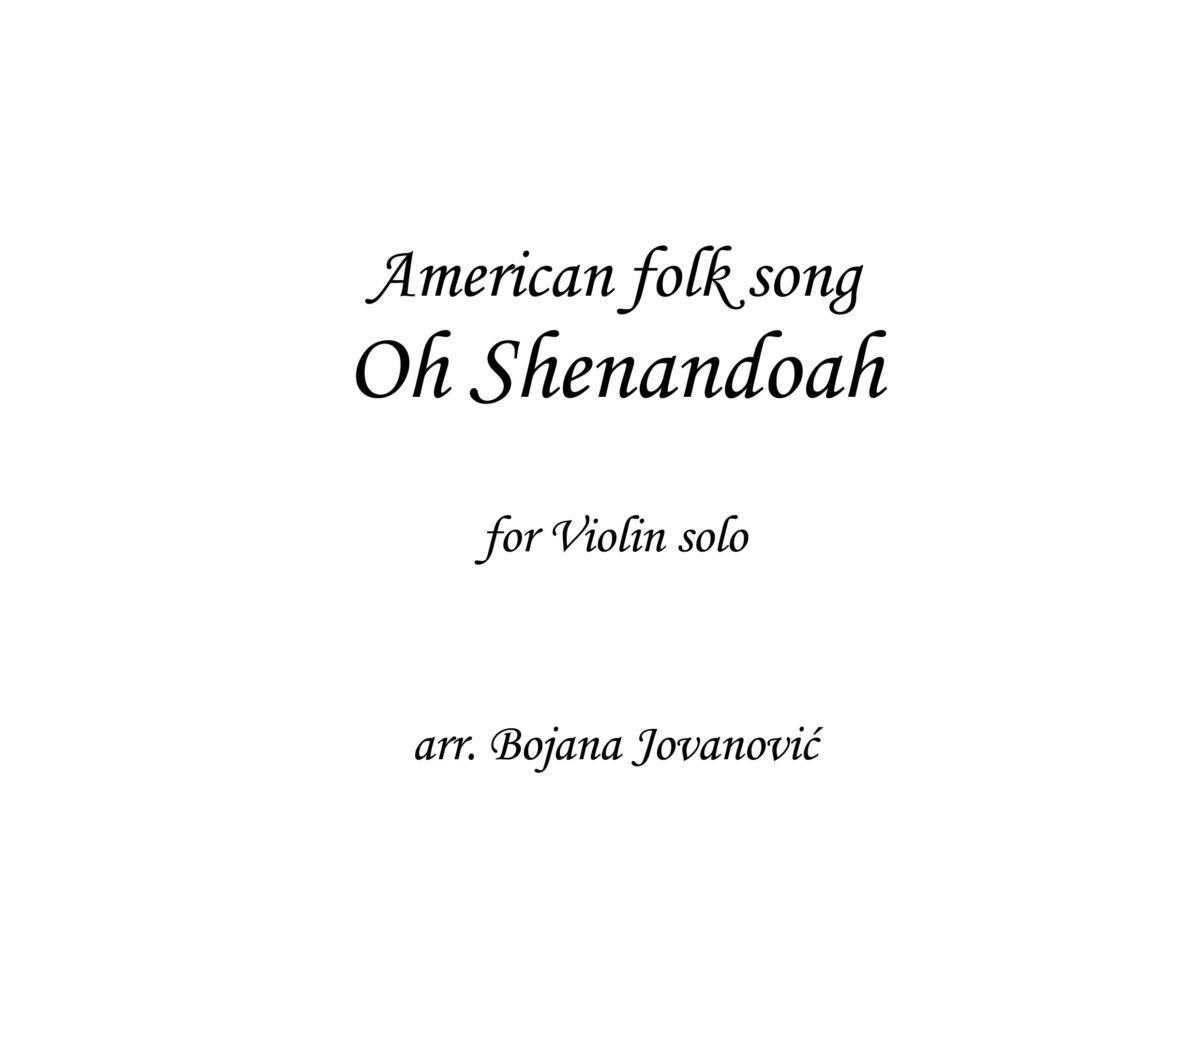 Shenandoah - American folk music - Sheet Music